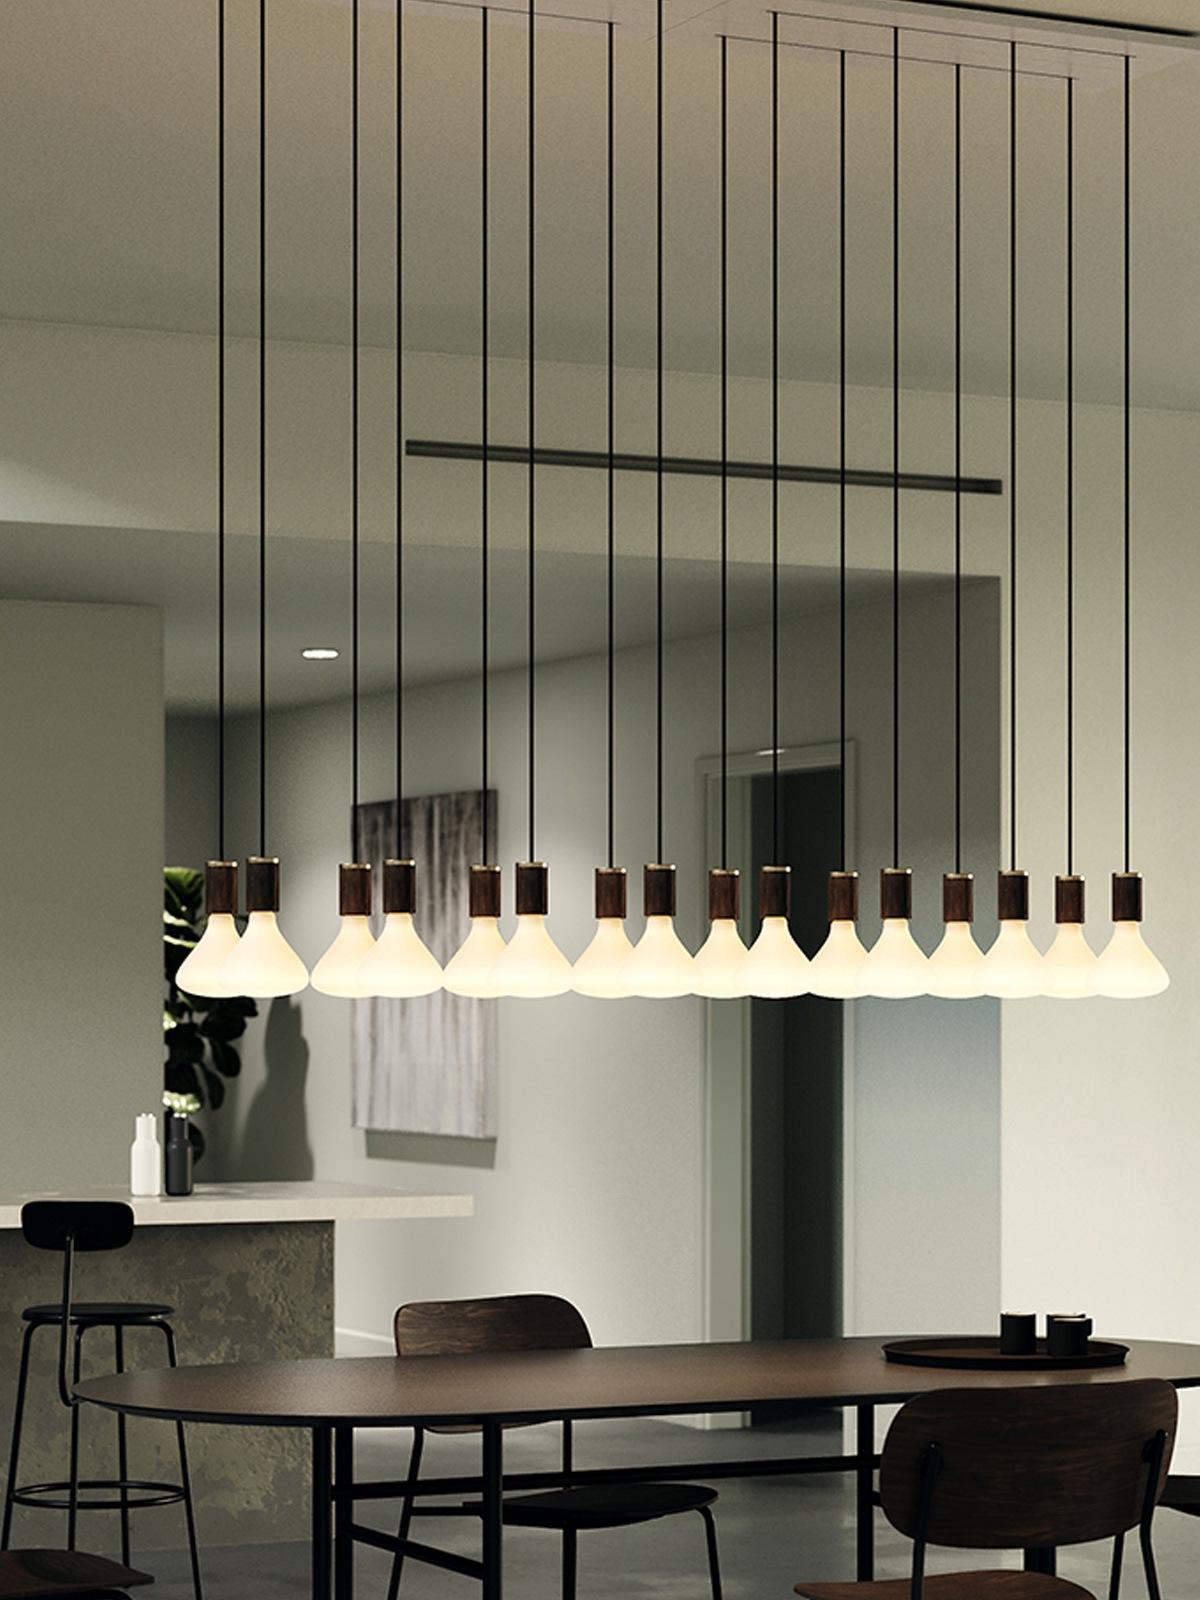 Pendant Light Holz Tala DesignOrt Lampen Onlineshop Berlin